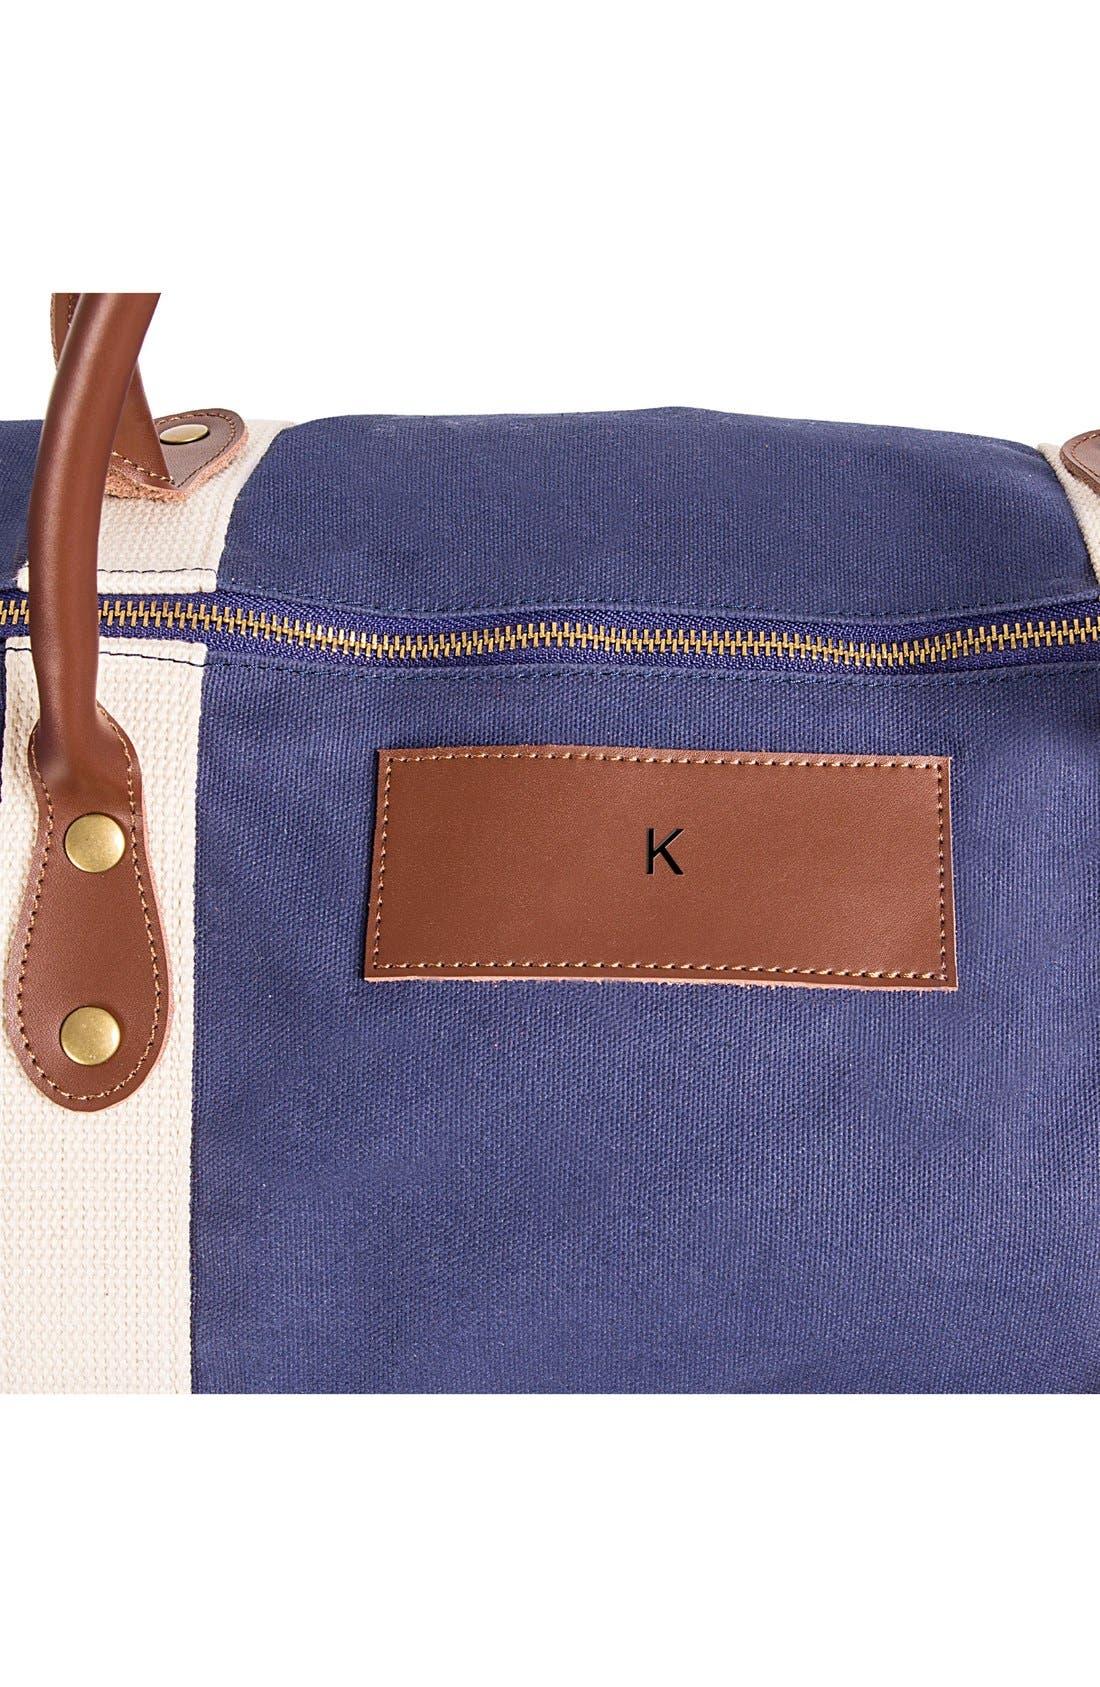 Alternate Image 5  - Cathy's Concepts Monogram Duffel Bag